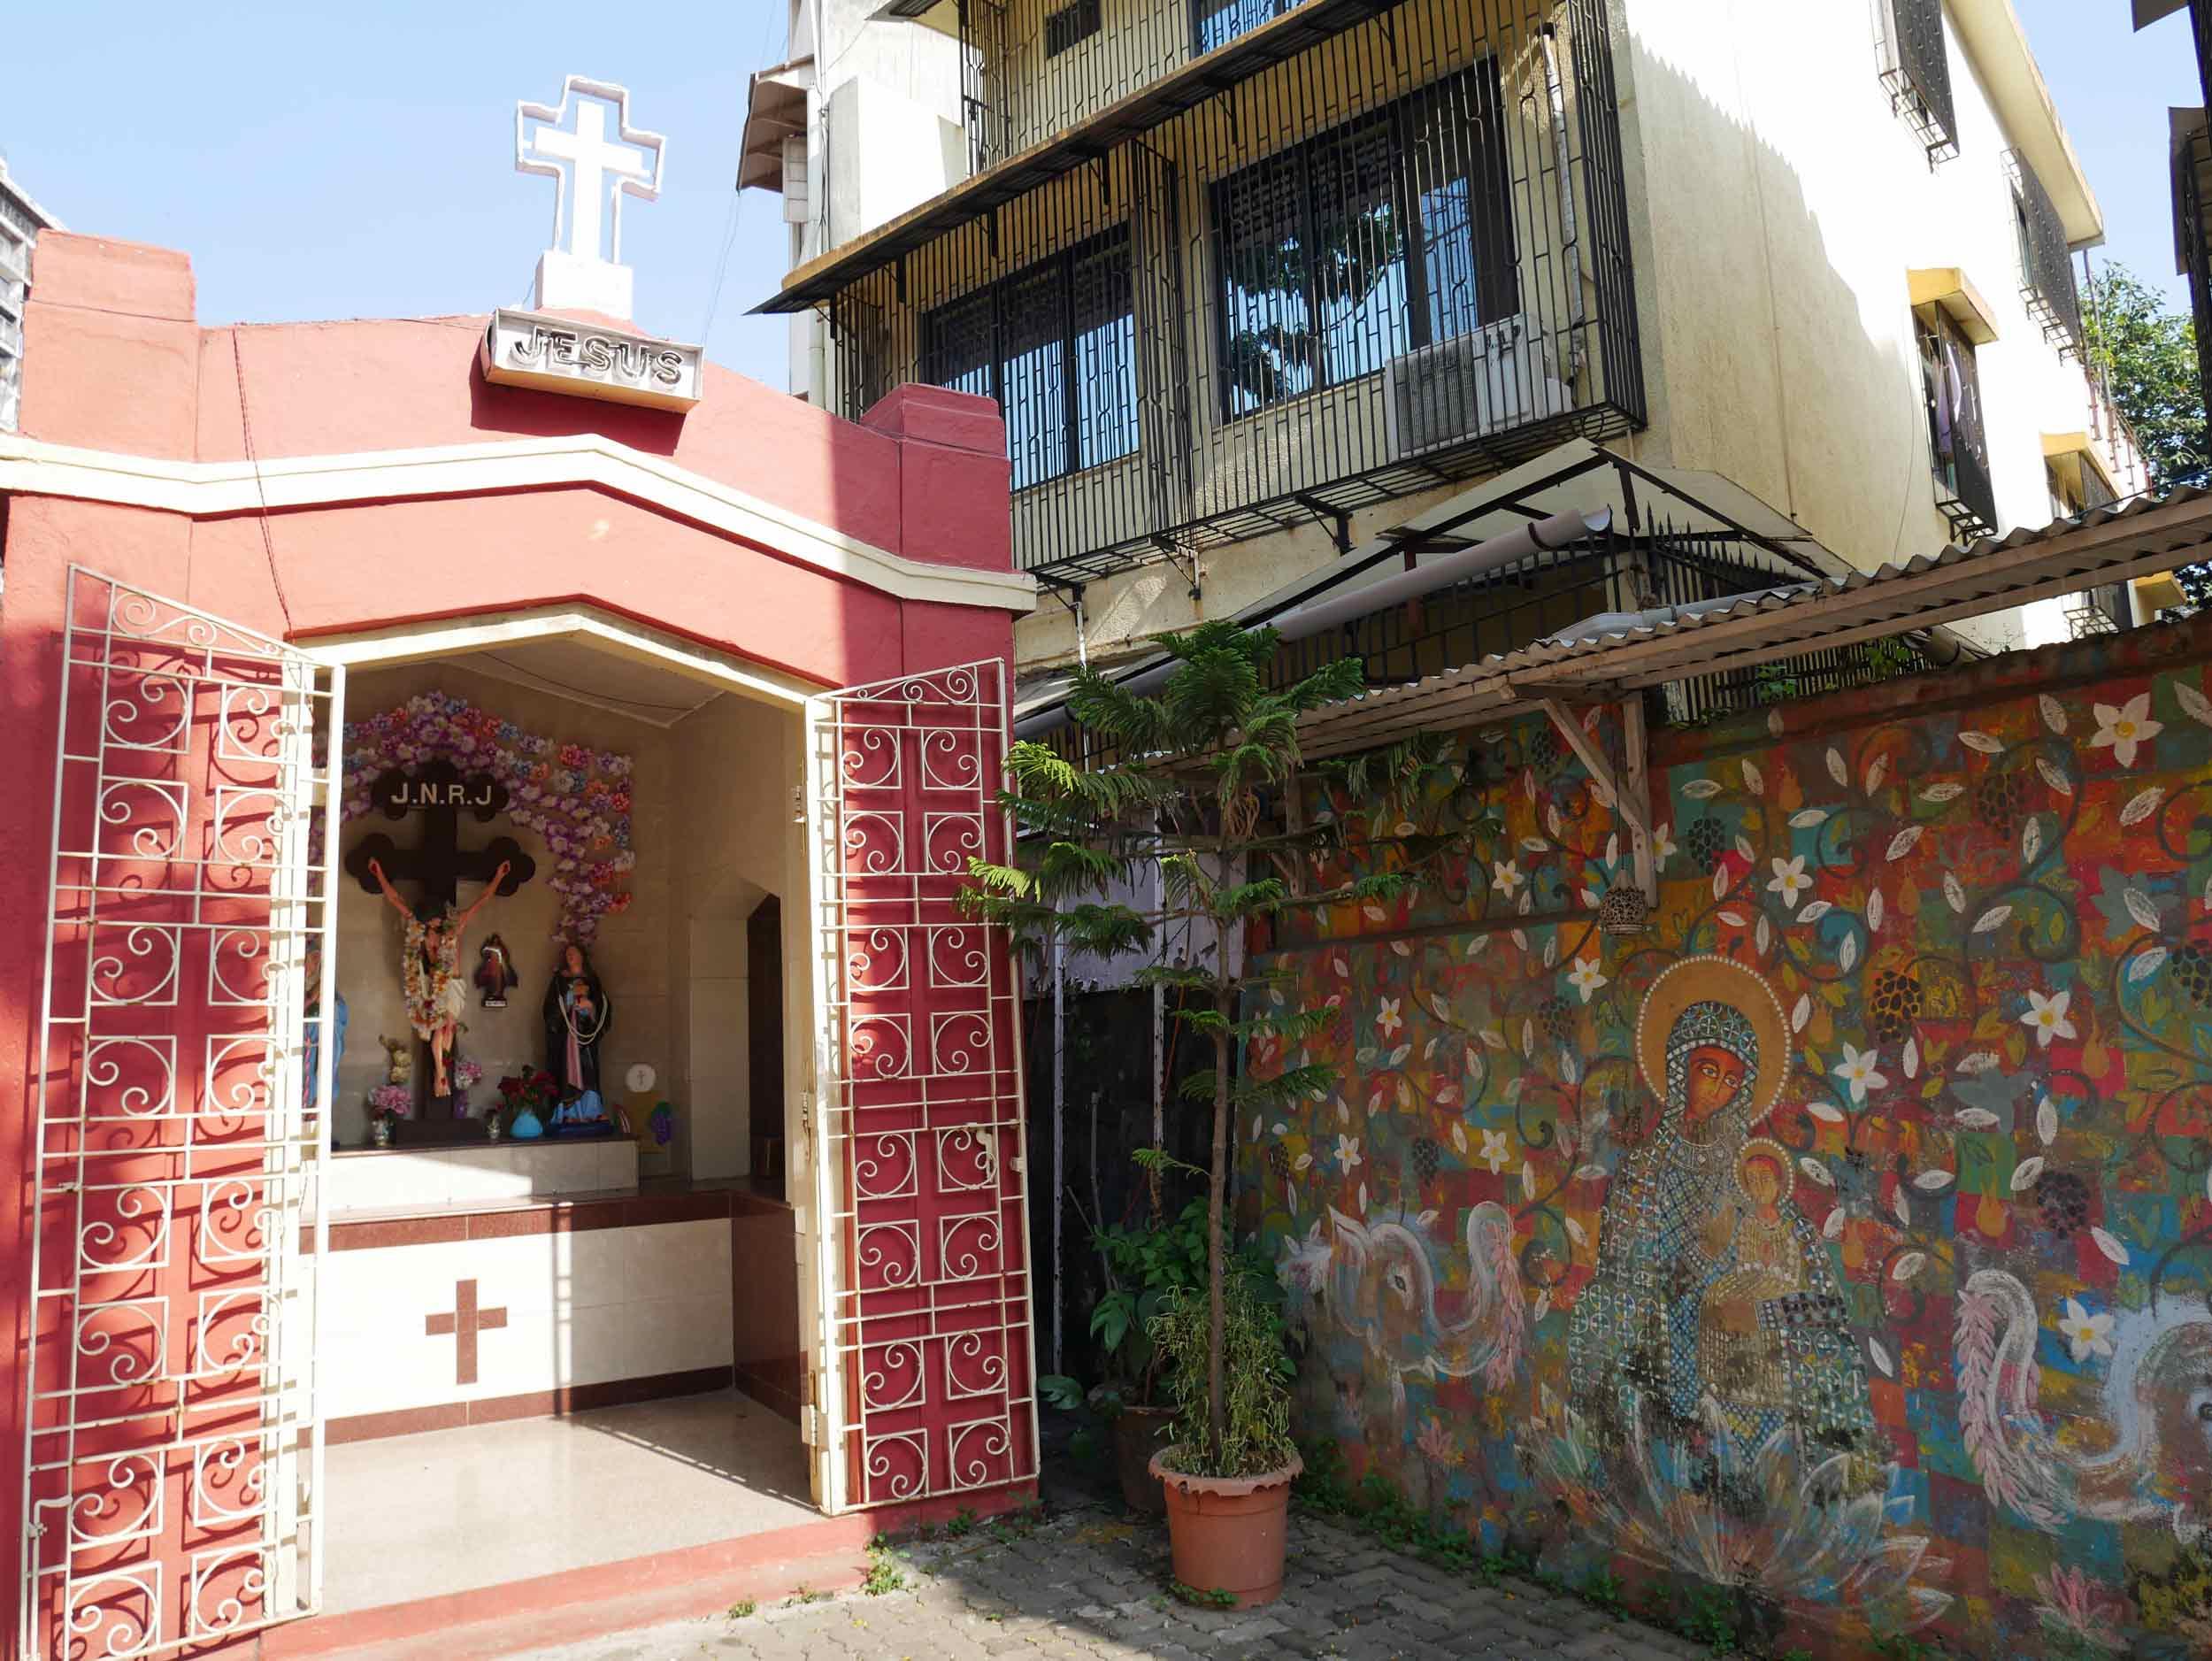 With its Latin heritage, Catholic alters adorn this vibrant neighborhood.